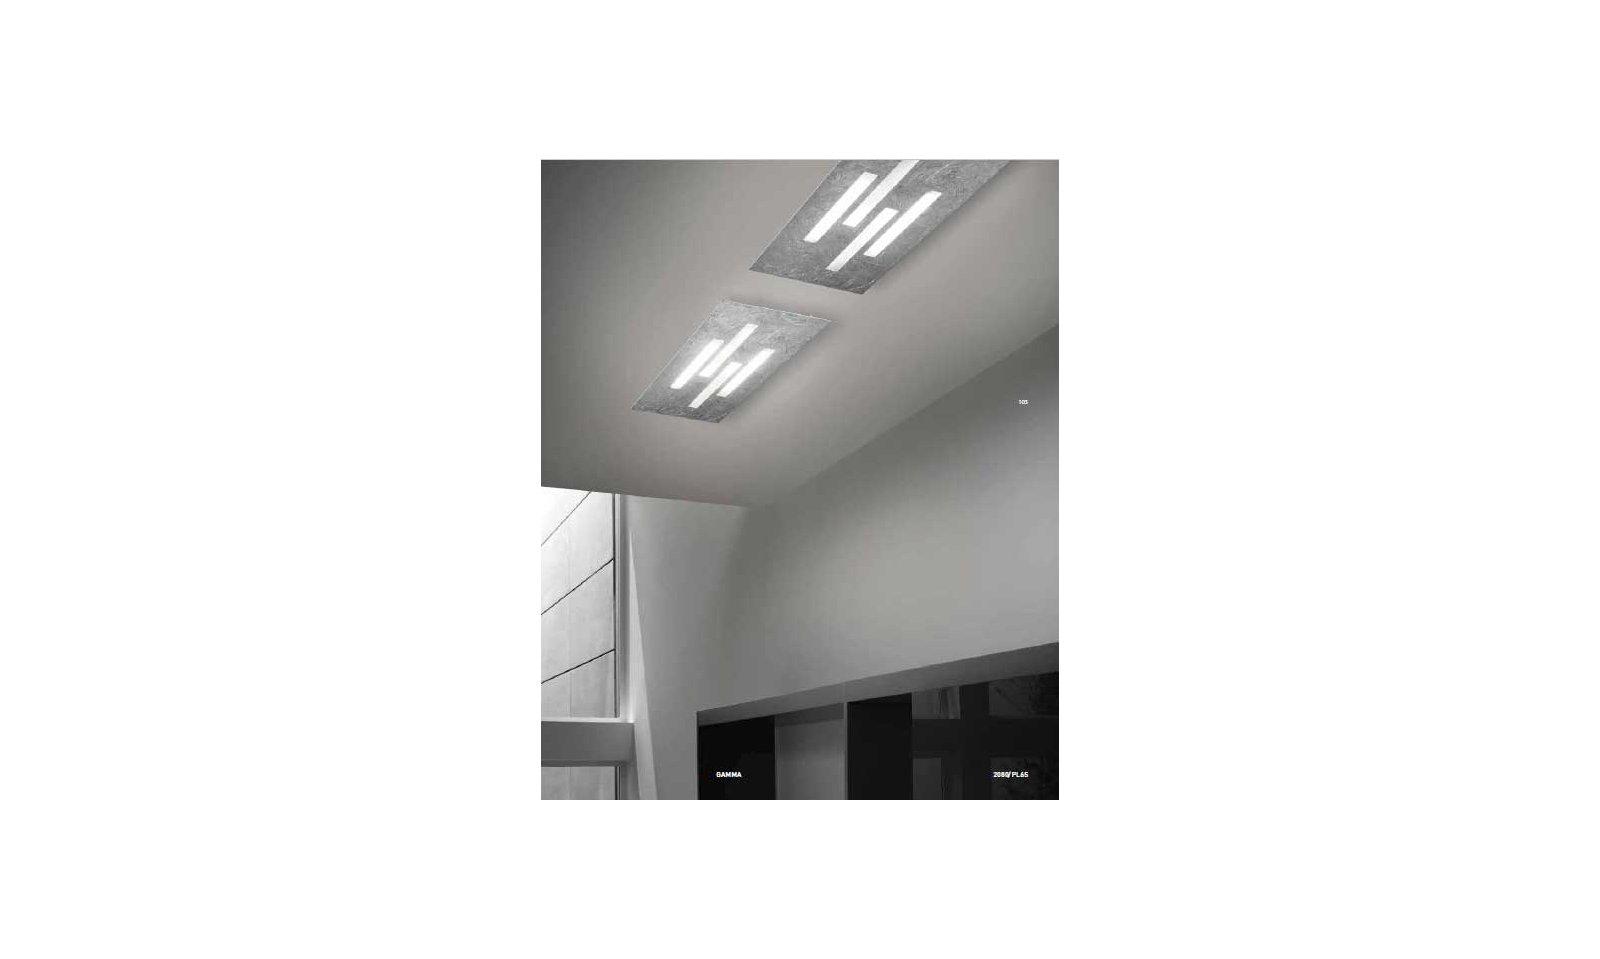 Gamma Led Lampen : Braga lighting led ceiling lamp gemma pl led ceiling lamp